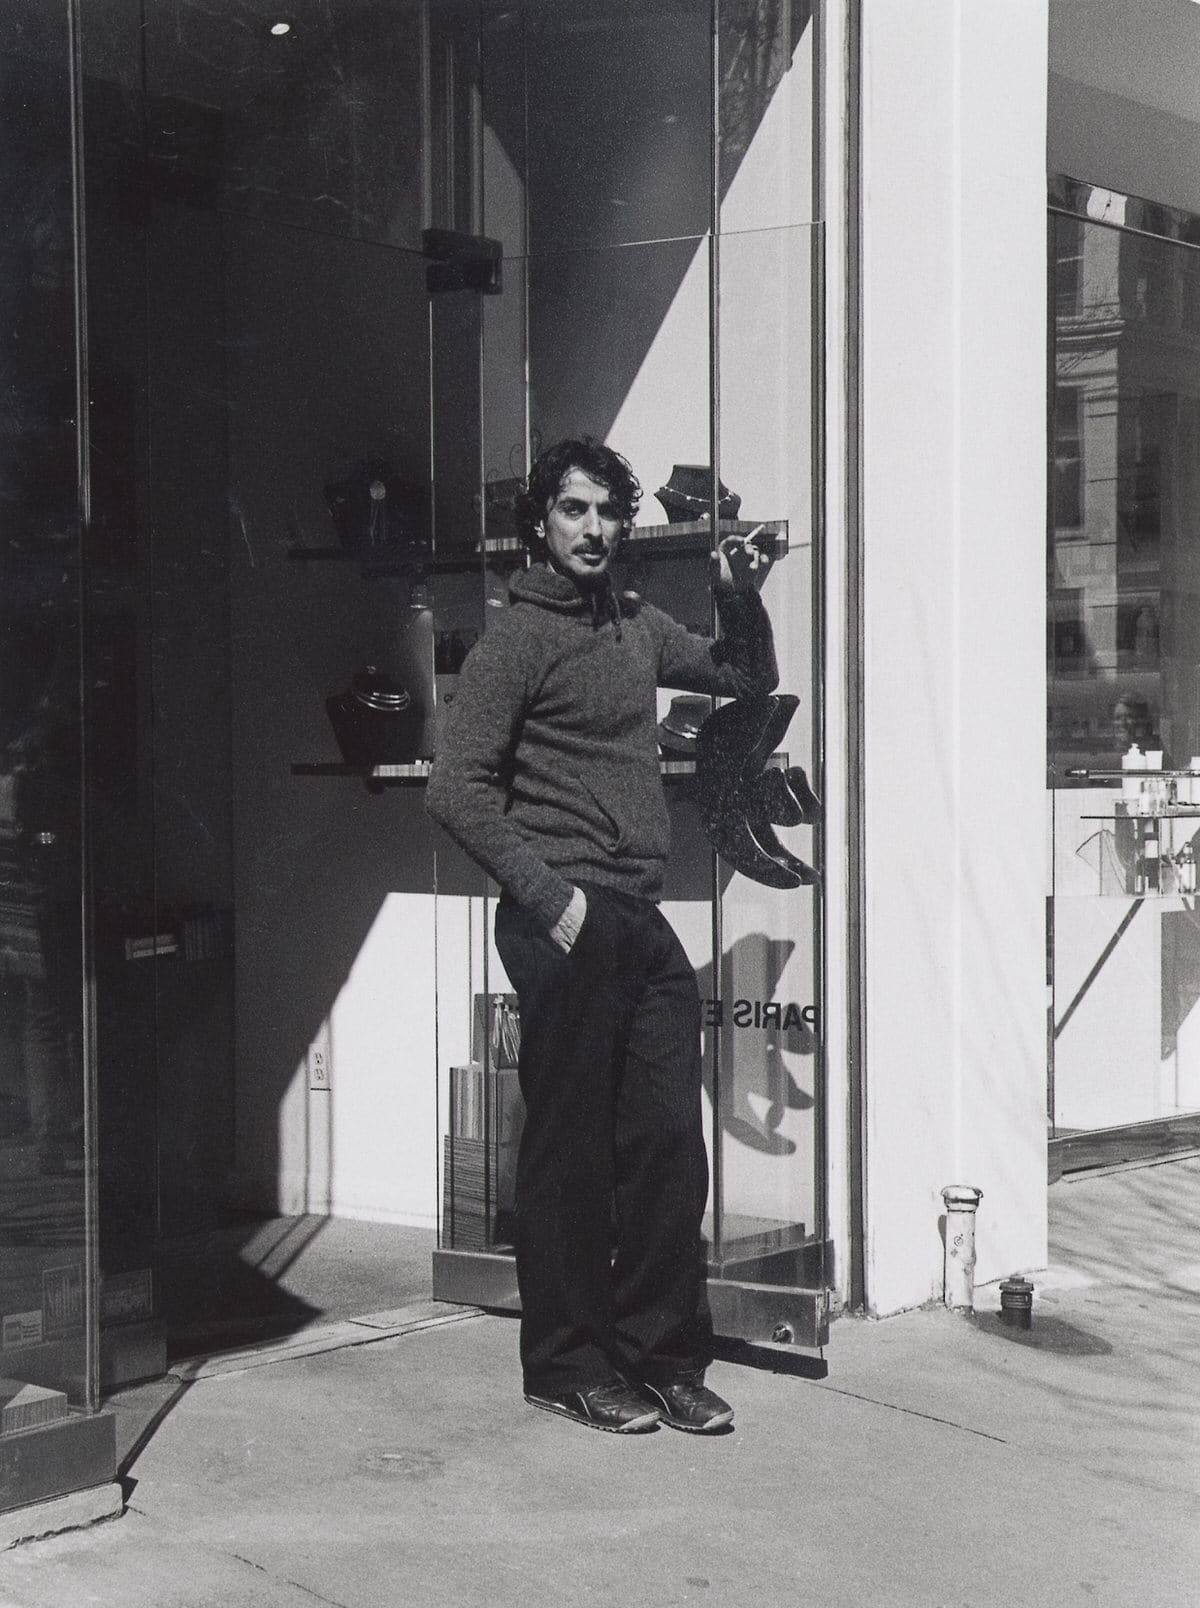 Manhattan-New-York-black-and-white-fine-art-street-photography-by-Studio-L-photographer-Laura-Schneider-_004